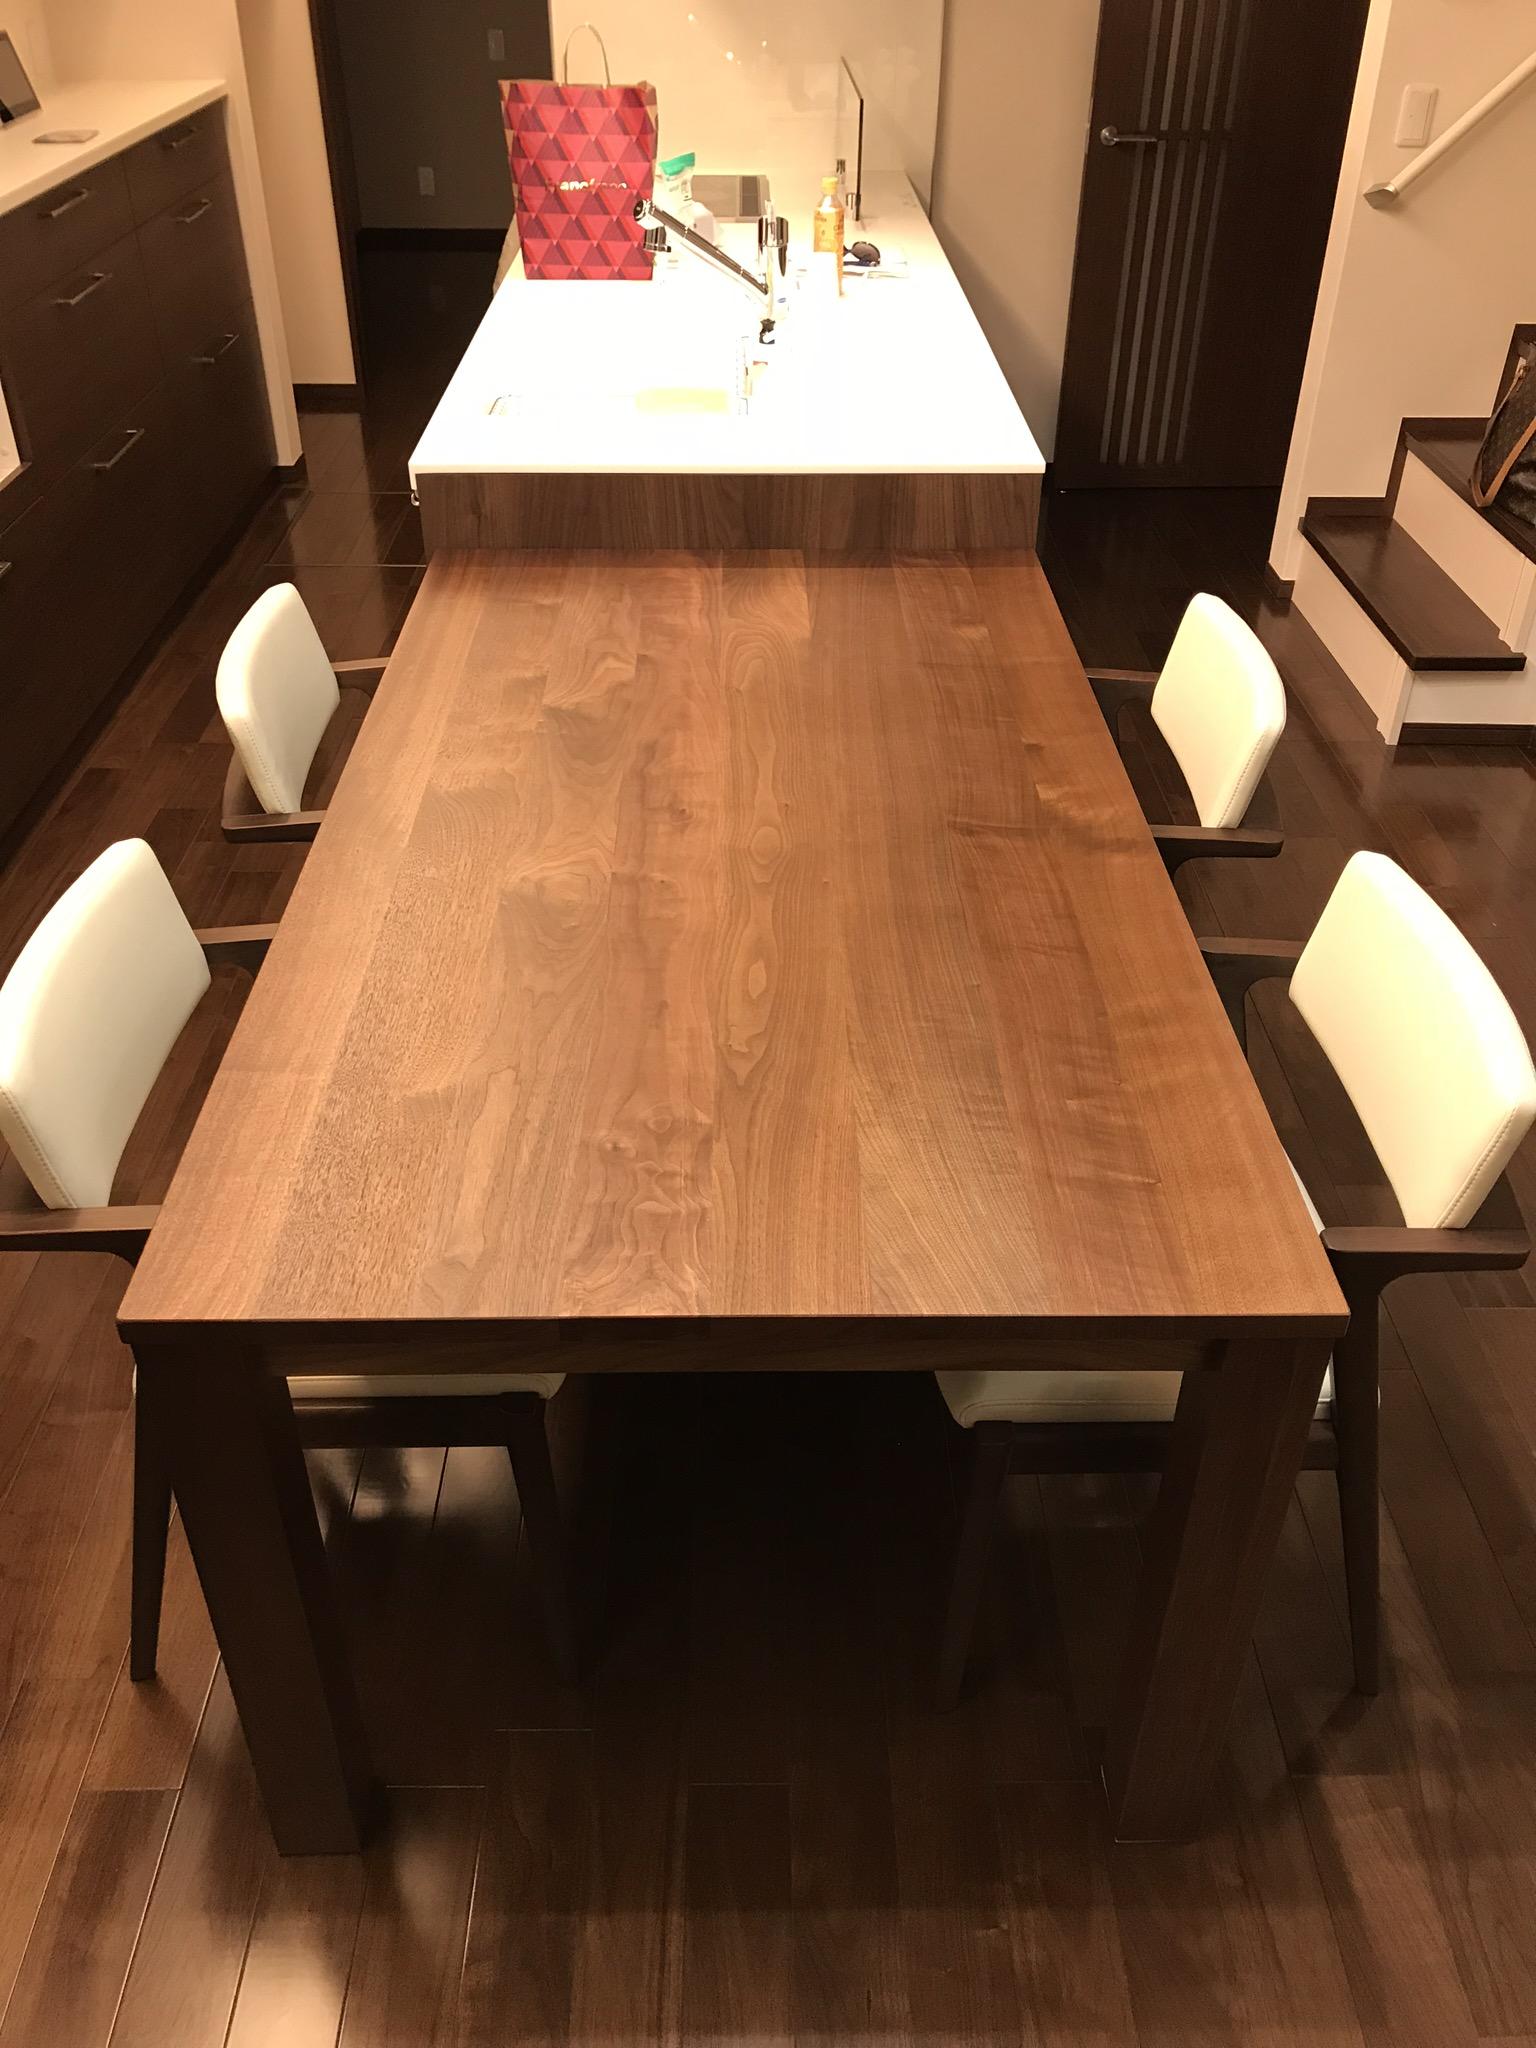 N様 / アイラーセン ストリームラインカウチソファ、 レン ダイニングテーブル